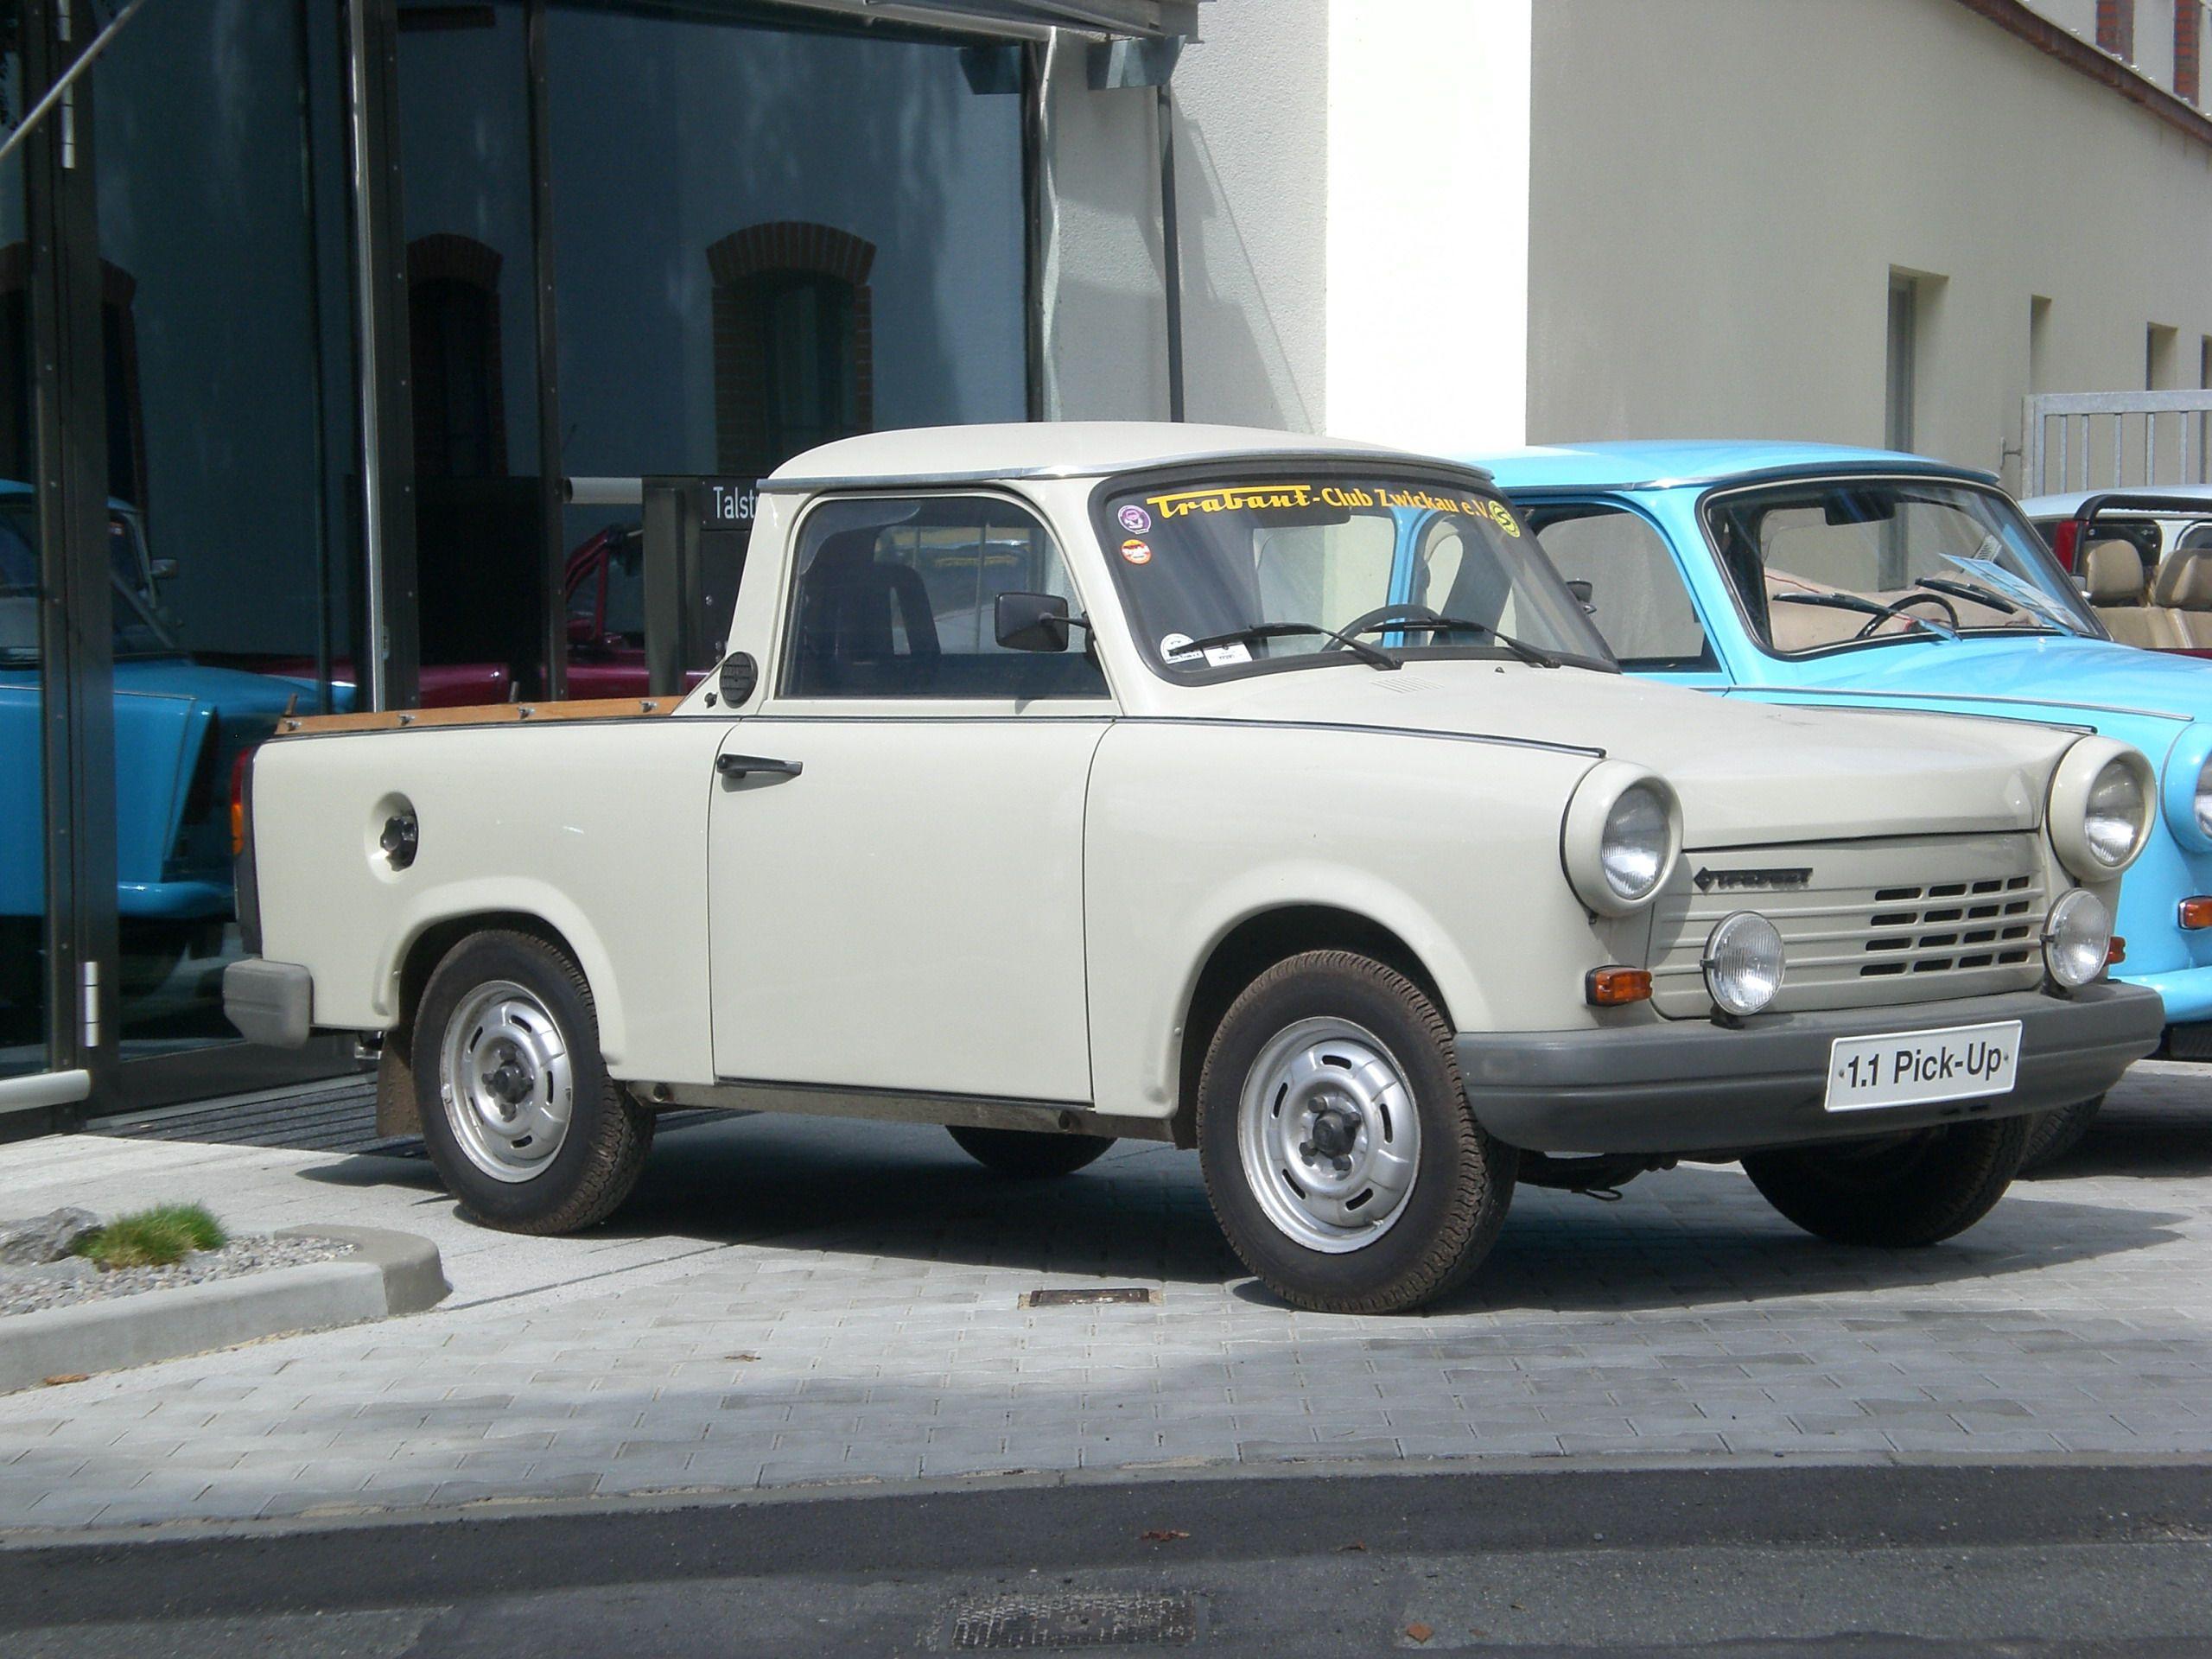 trabant pick up - Google Search | Trabant | Pinterest | Car photos ...